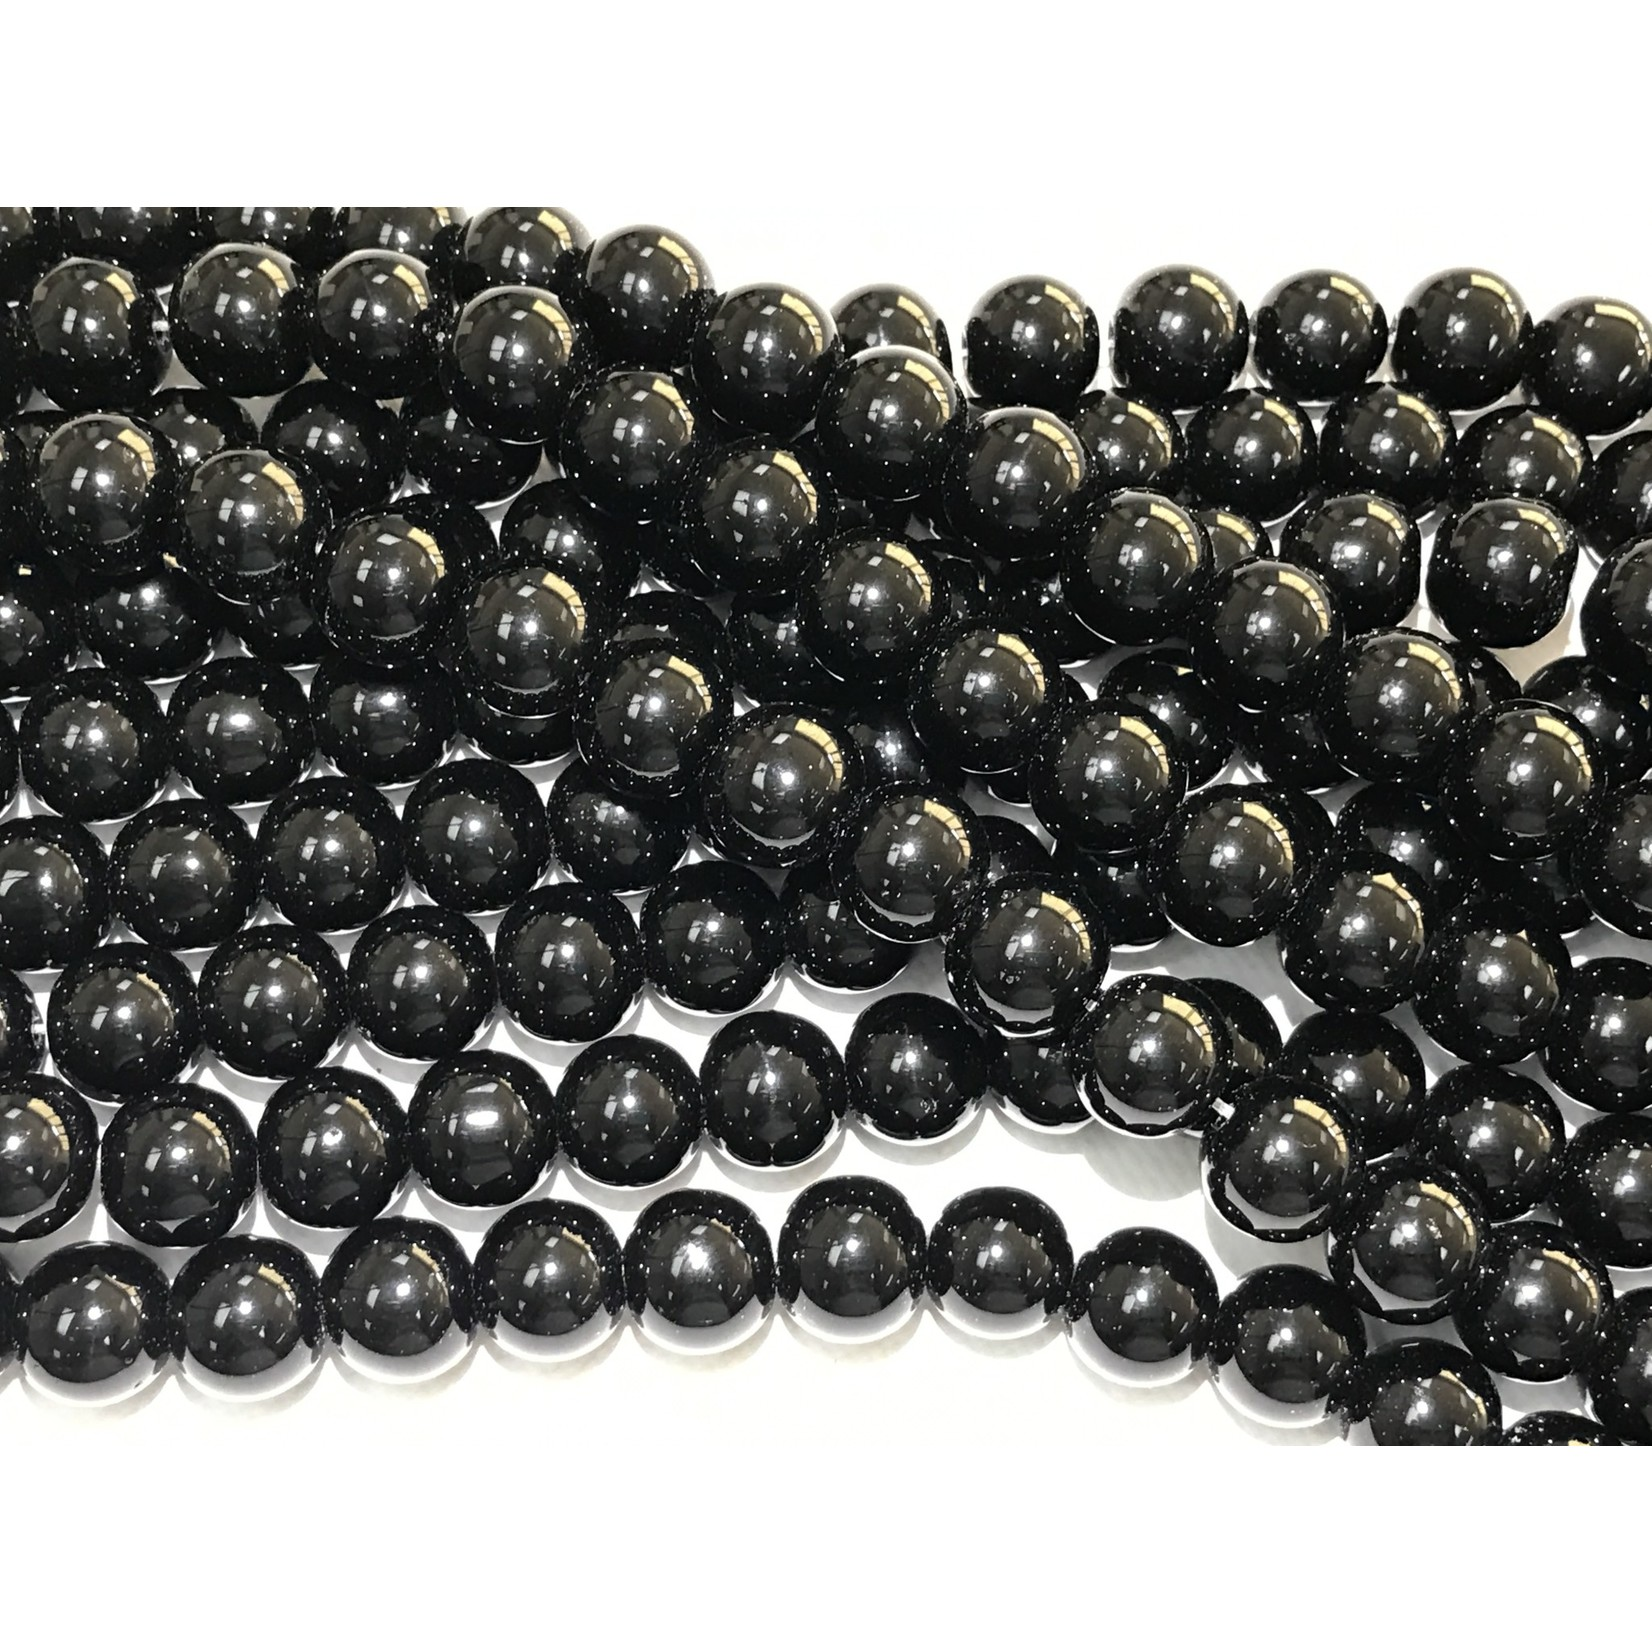 Agate Round Beads - Black - 14mm